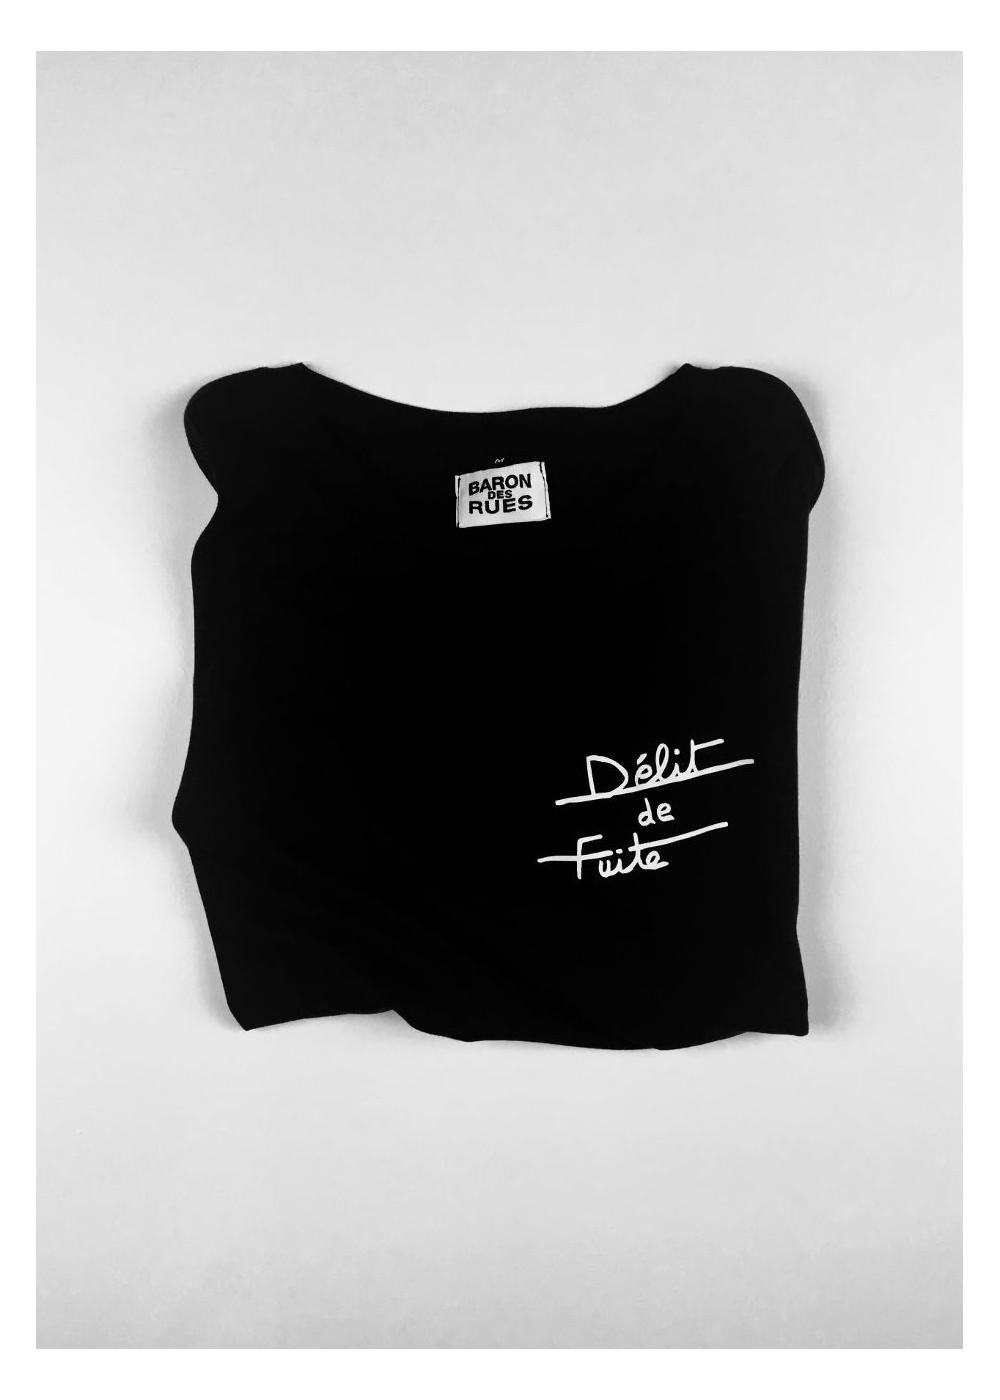 charlesrayandcoco- blog deco et design - selection noel - homme - baron des rues - t-shirt - delit-de-fuite